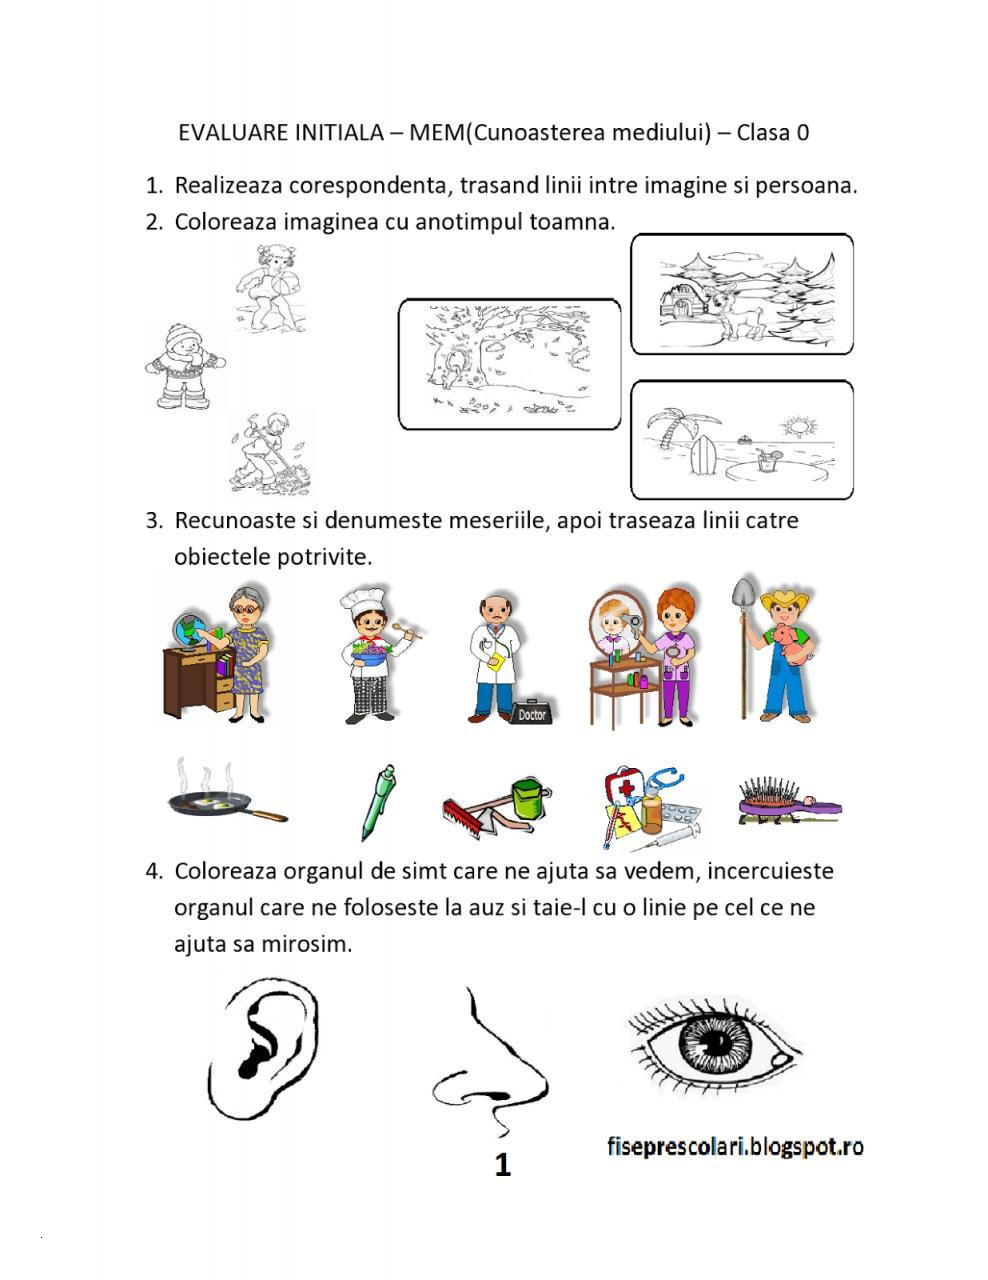 The Legend Of Zelda Ausmalbilder Inspirierend Malvorlagen Igel Einzigartig Igel Grundschule 0d Archives Genial Bild